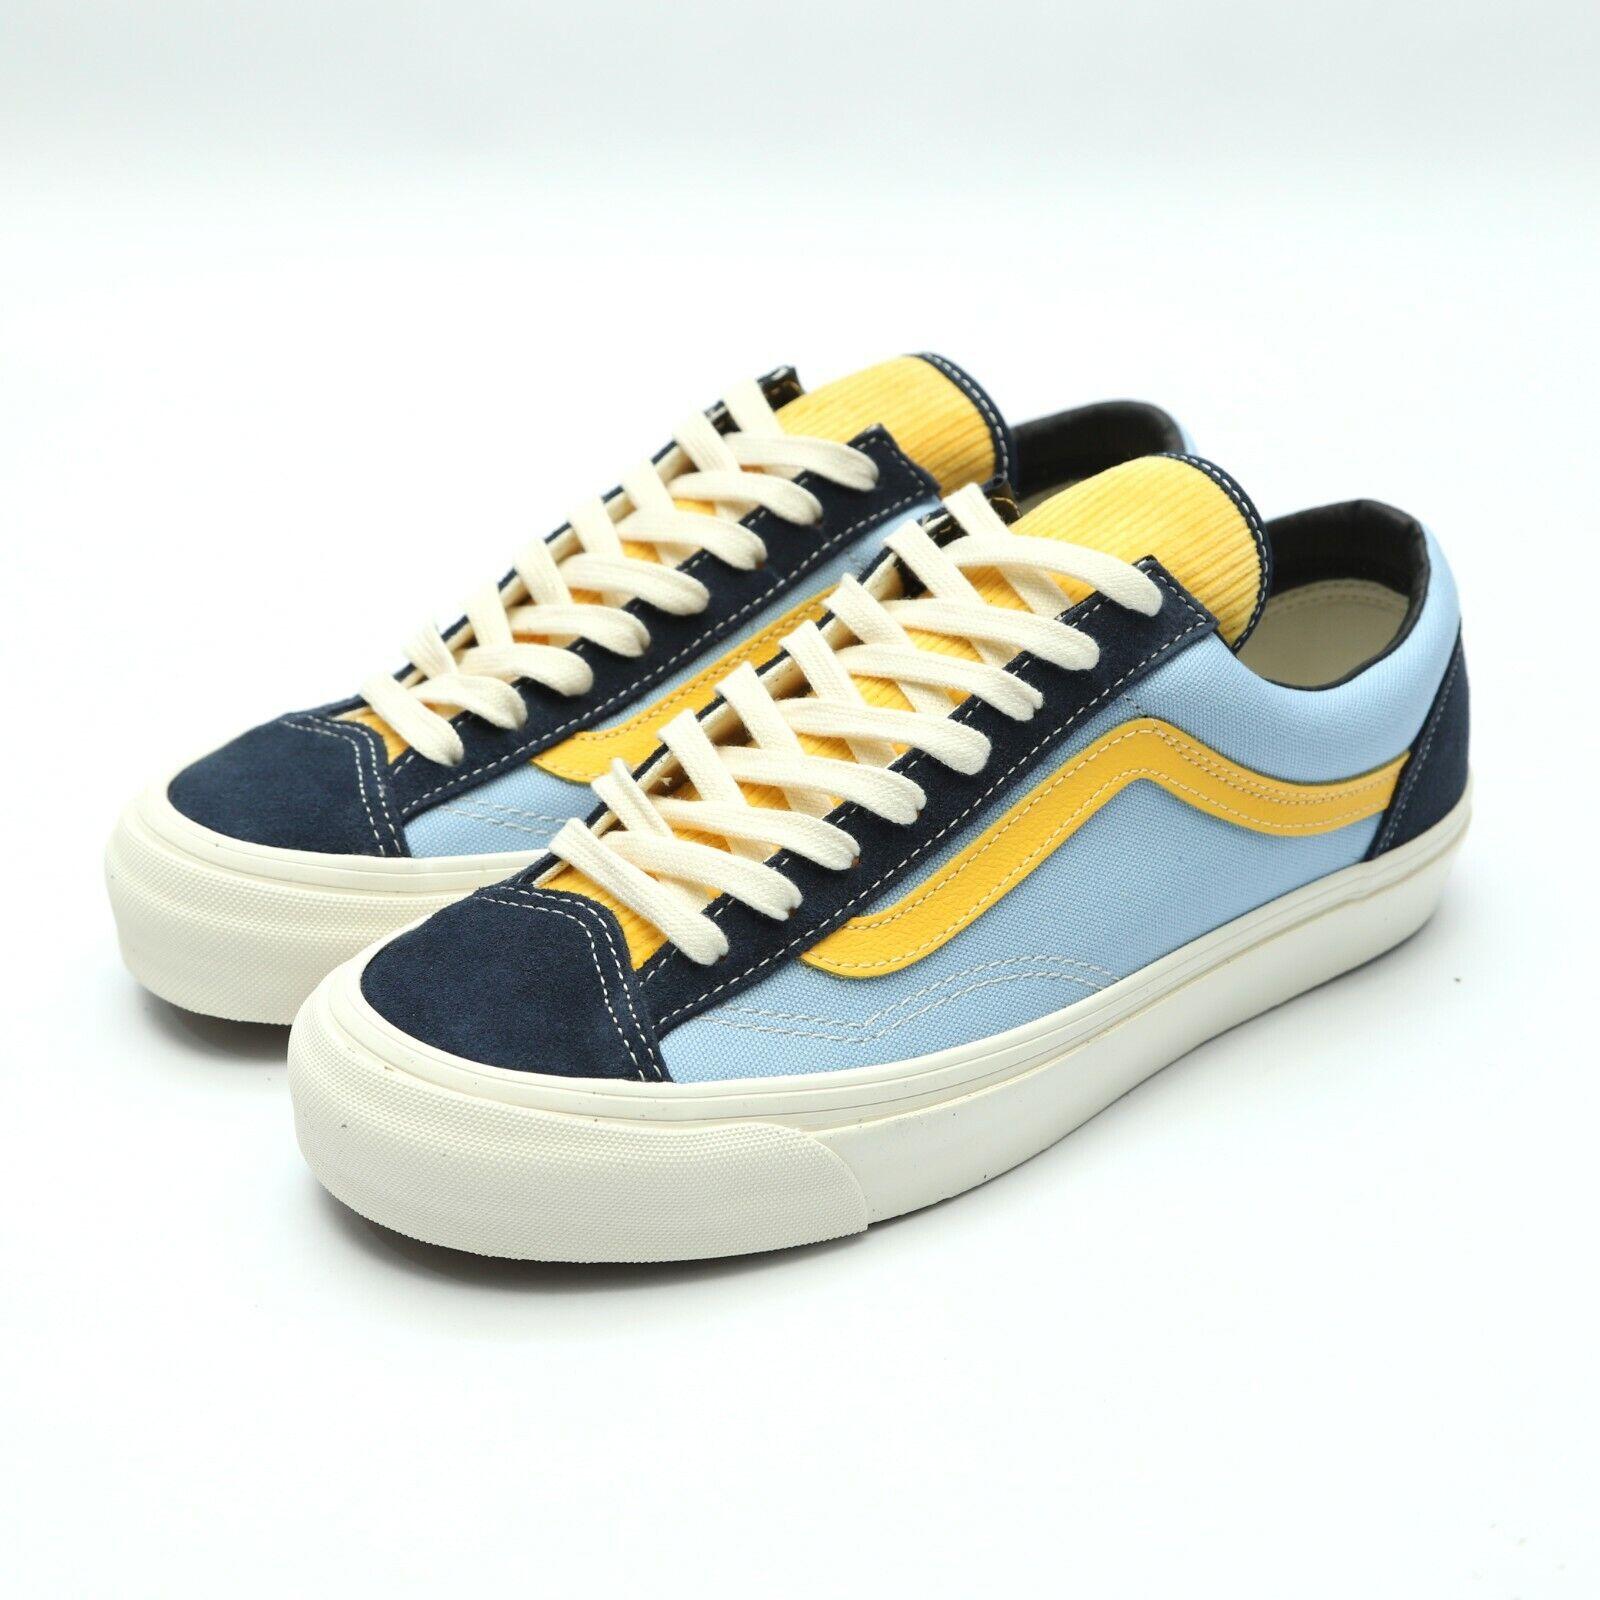 OG Style 36 LX | Old Gold | Vans, Style, Vans old skool sneaker